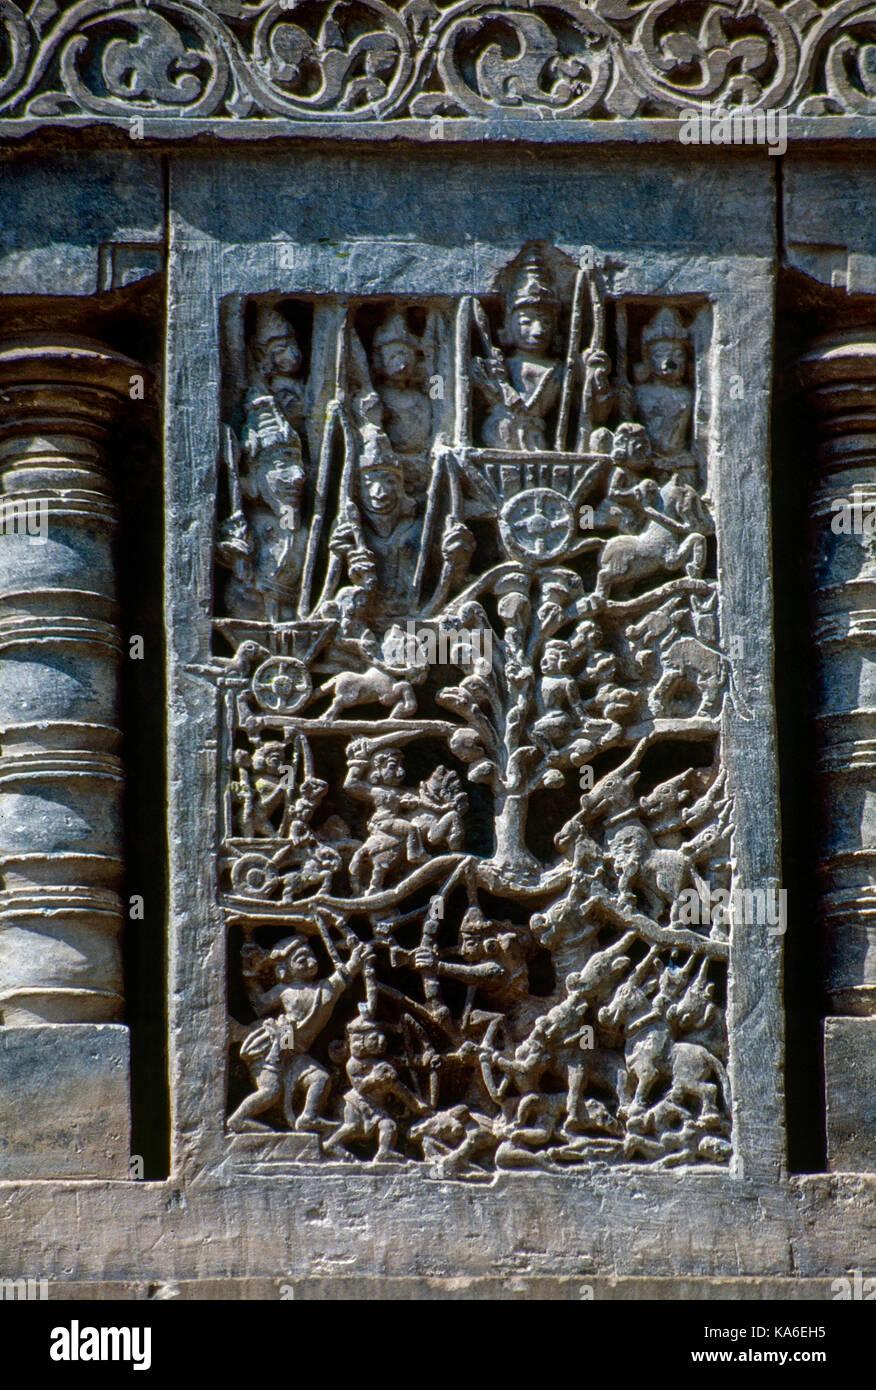 Mahabharata Battle scene relief on wall, Chennakesava temple, karnataka , India, Asia - Stock Image